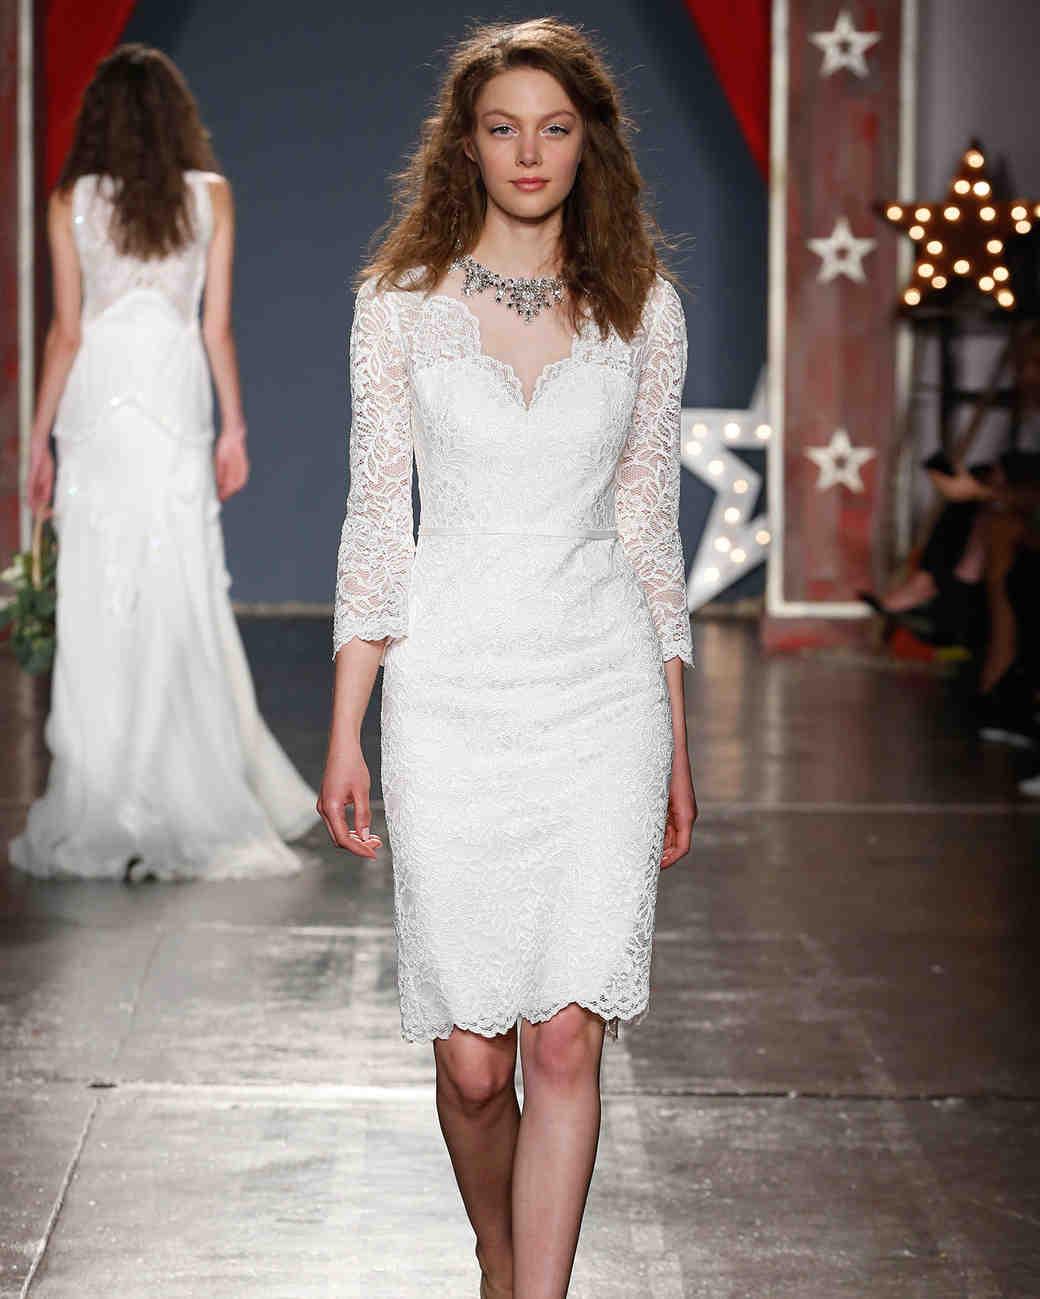 jenny packham wedding dress spring 2018 knee length three-quarter length sleeve